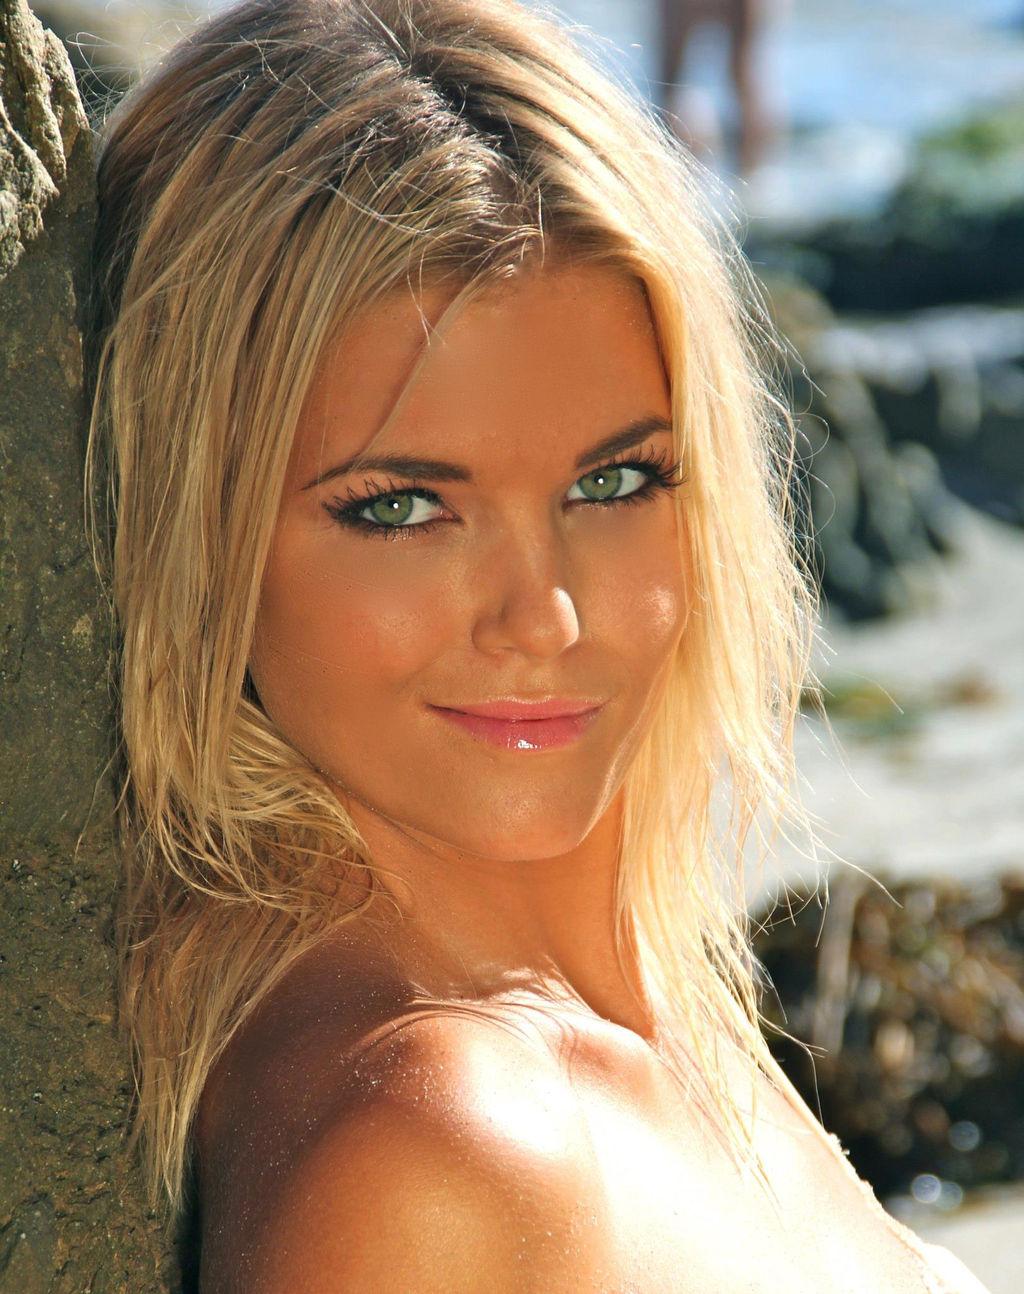 krissa fowles model actress